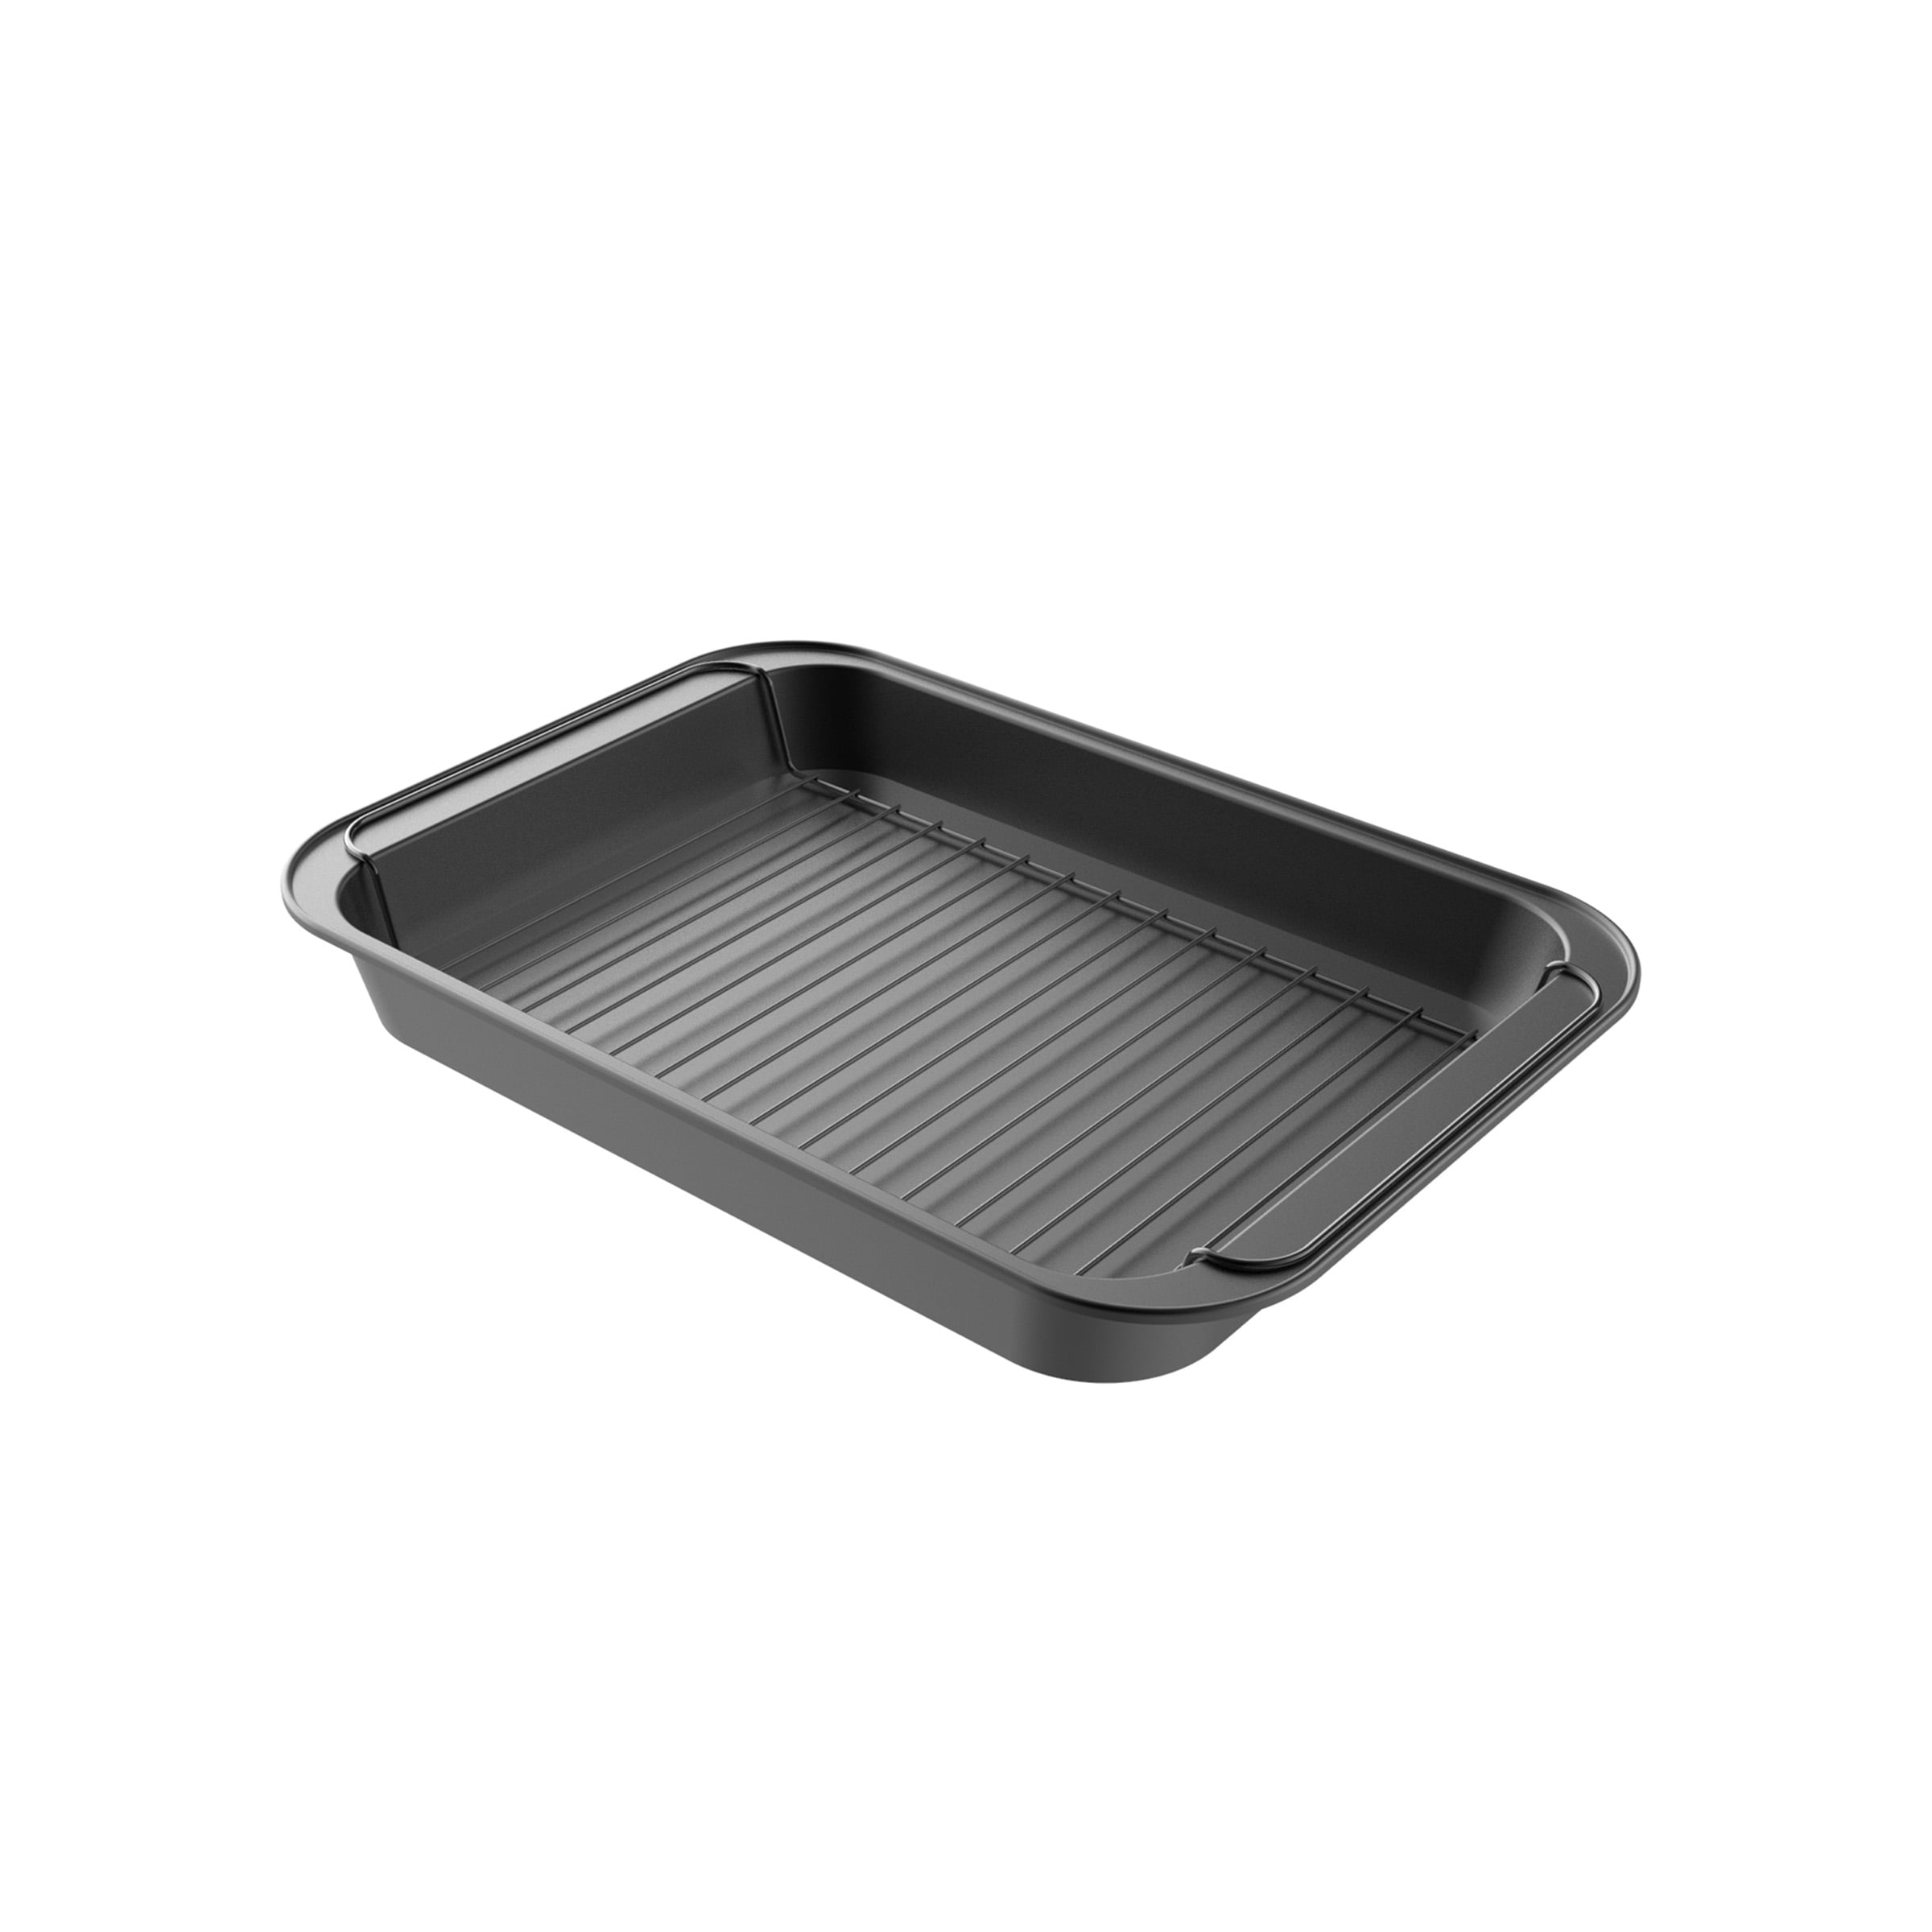 Farberware Buena Cocina Nonstick Roaster with Rack 15-Inch x 11-Inch Gray